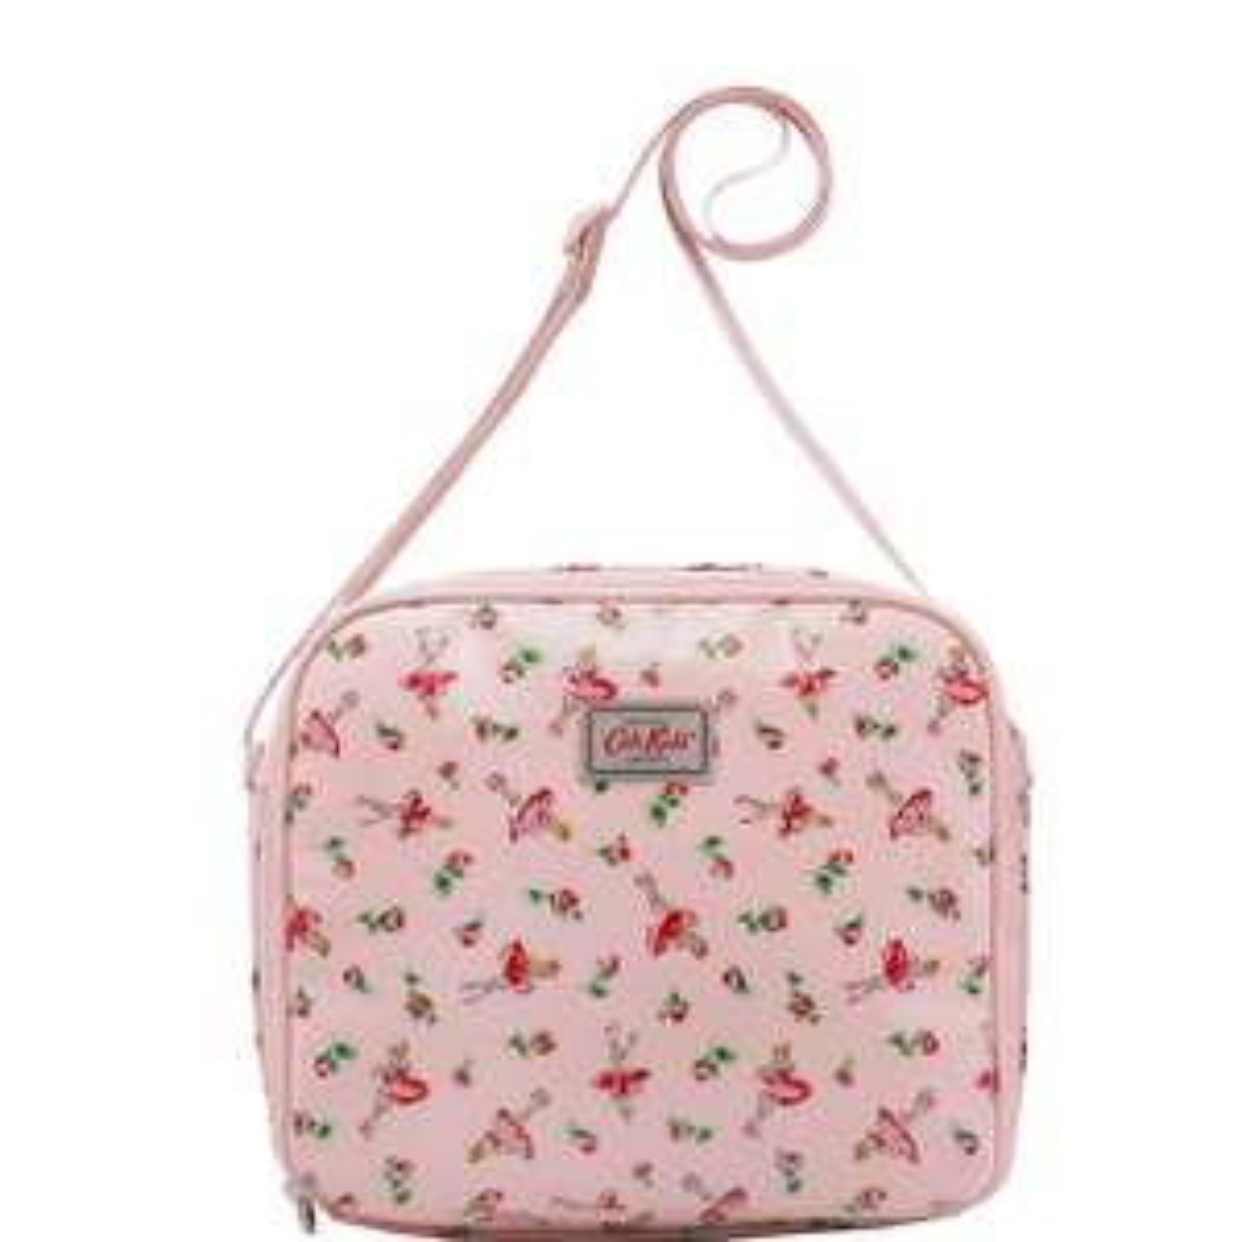 Ballerina Cath Kidson lunch bag £9 @ John lewis - £2 c&c